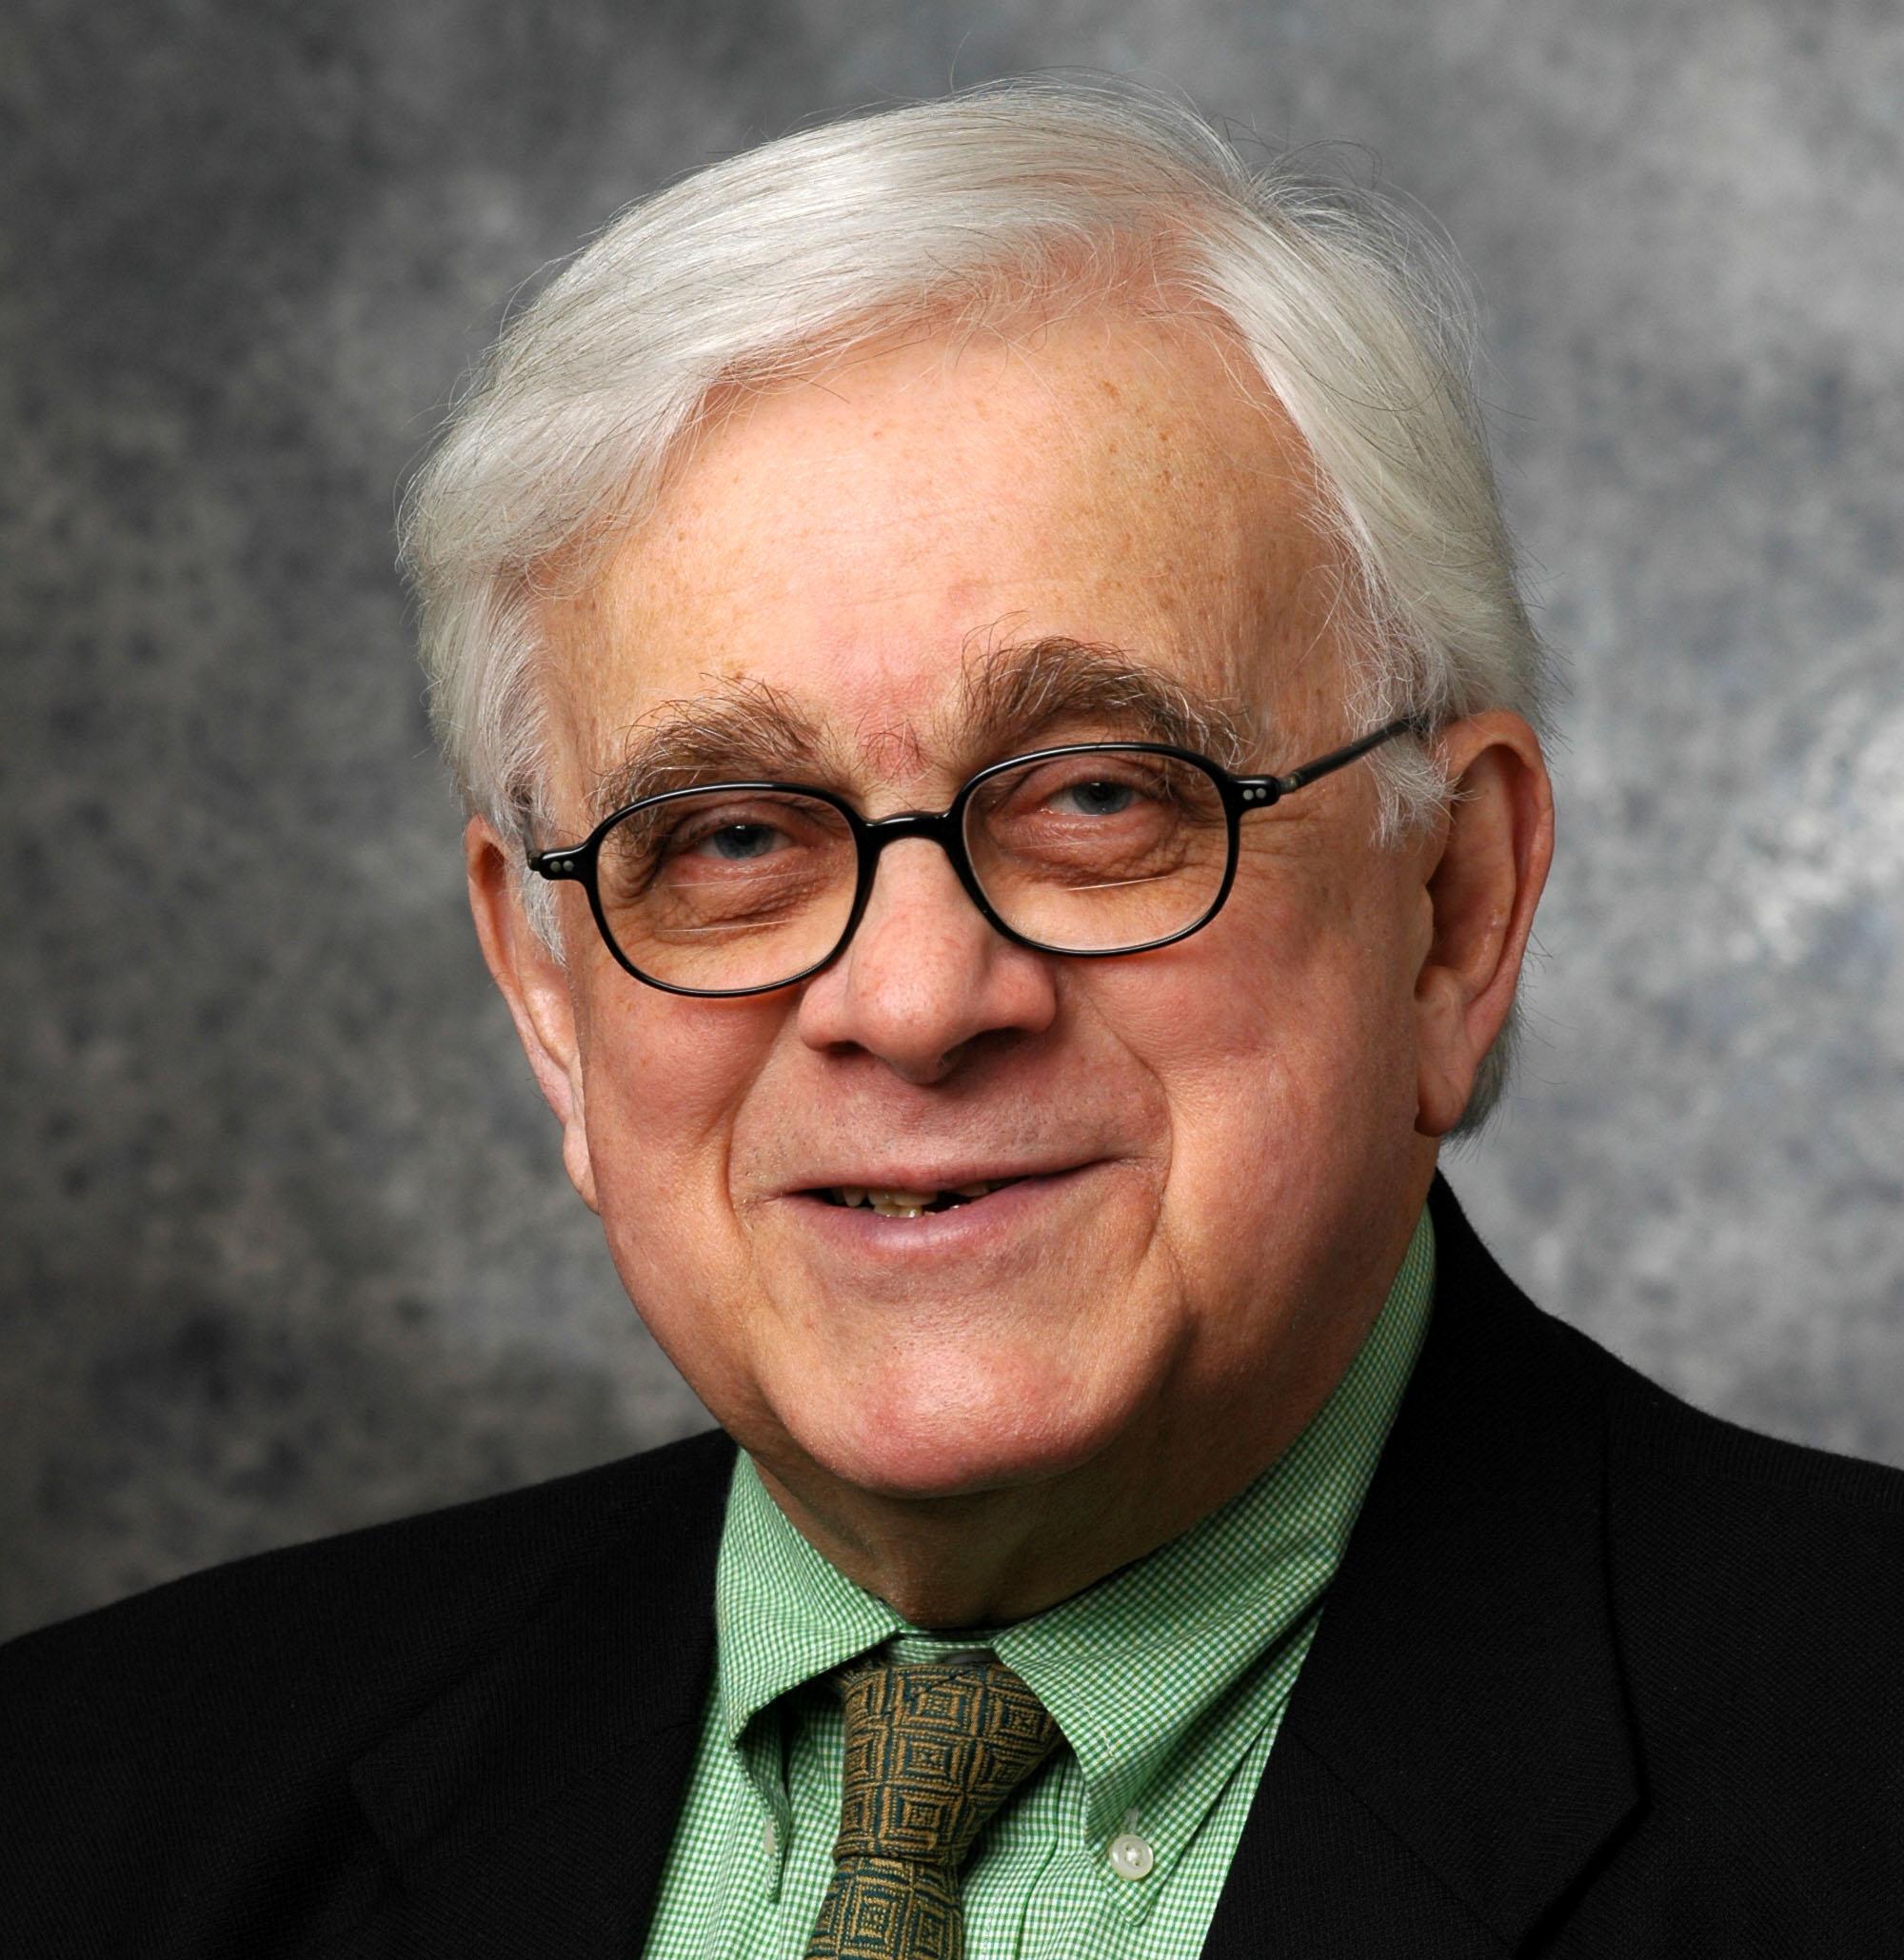 SMU History Professor Jeremy Adams